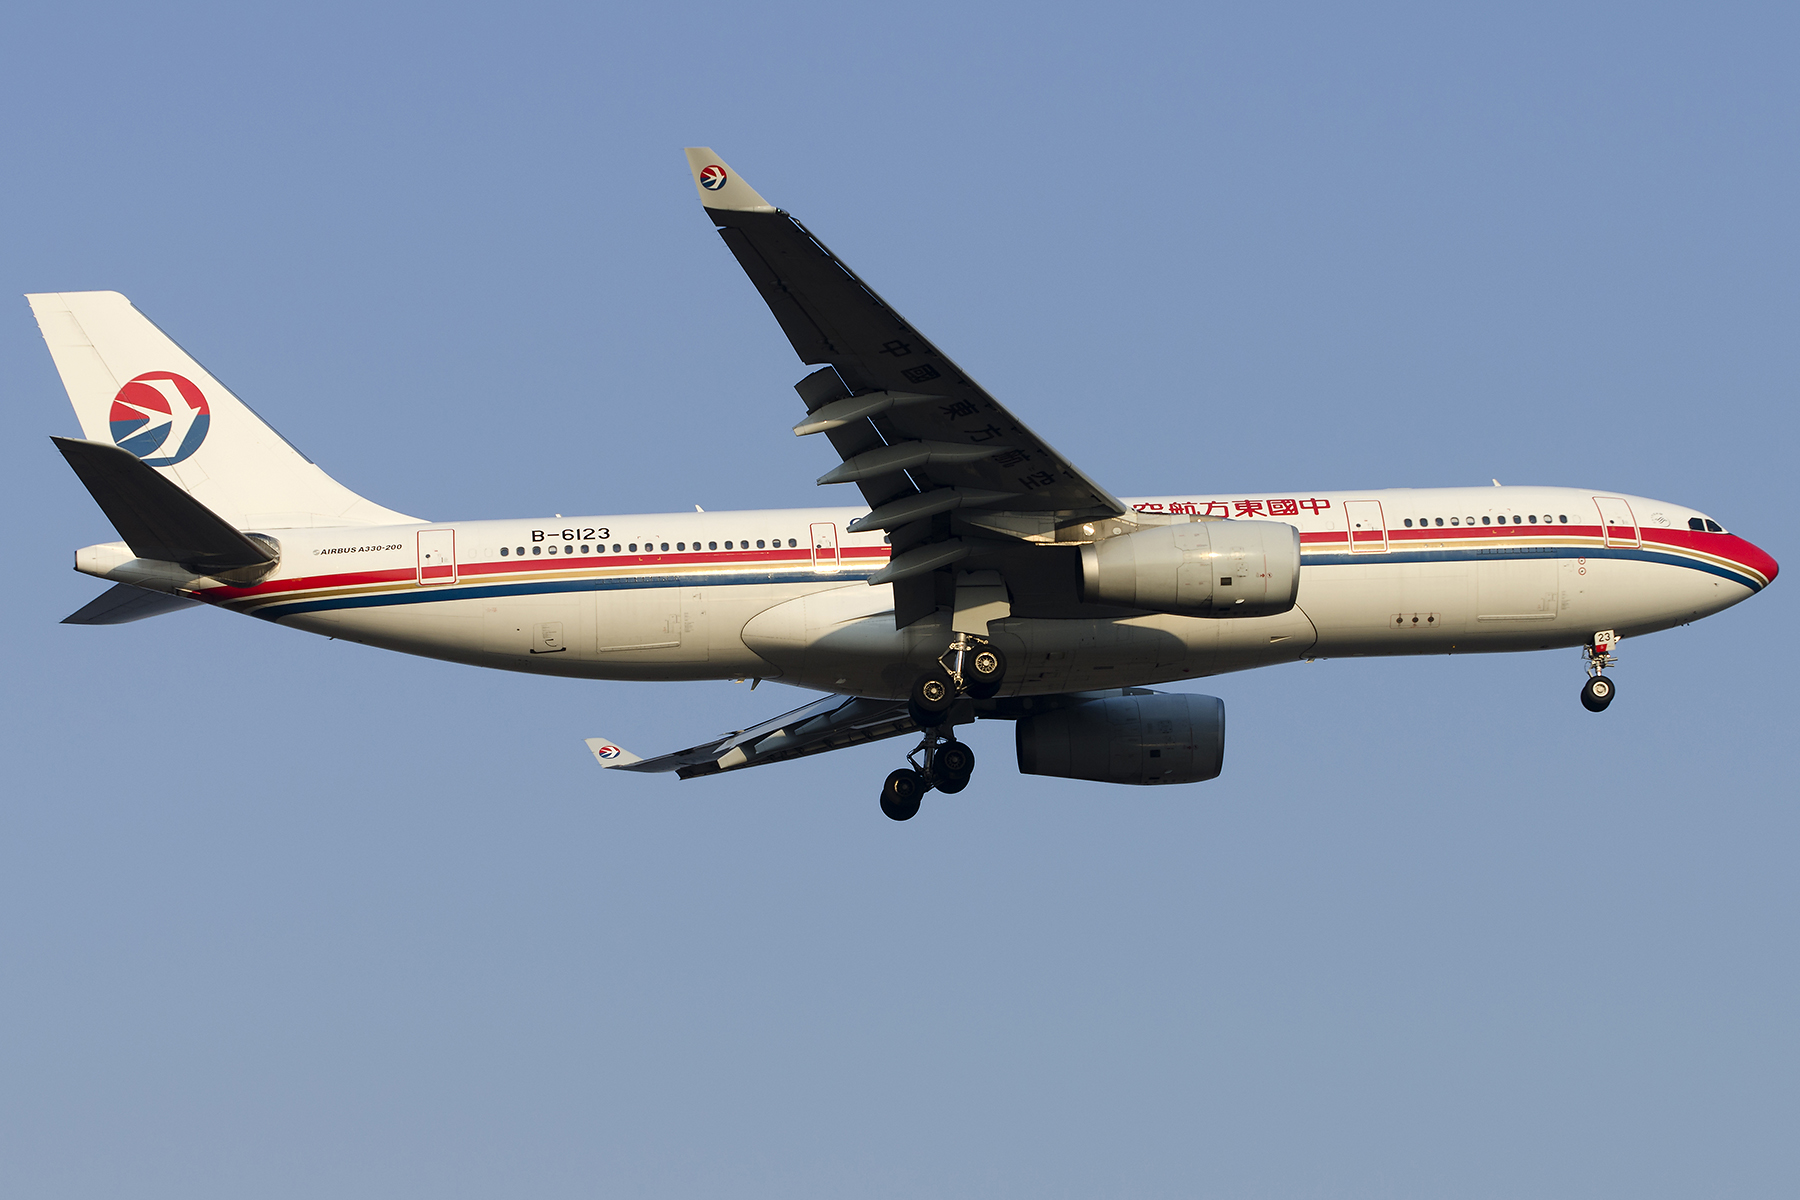 Re:[原创][原创]【PVG】好久没发图了,一堆库存(2)午后 AIRBUS A330-200 B-6123 中国上海浦东国际机场